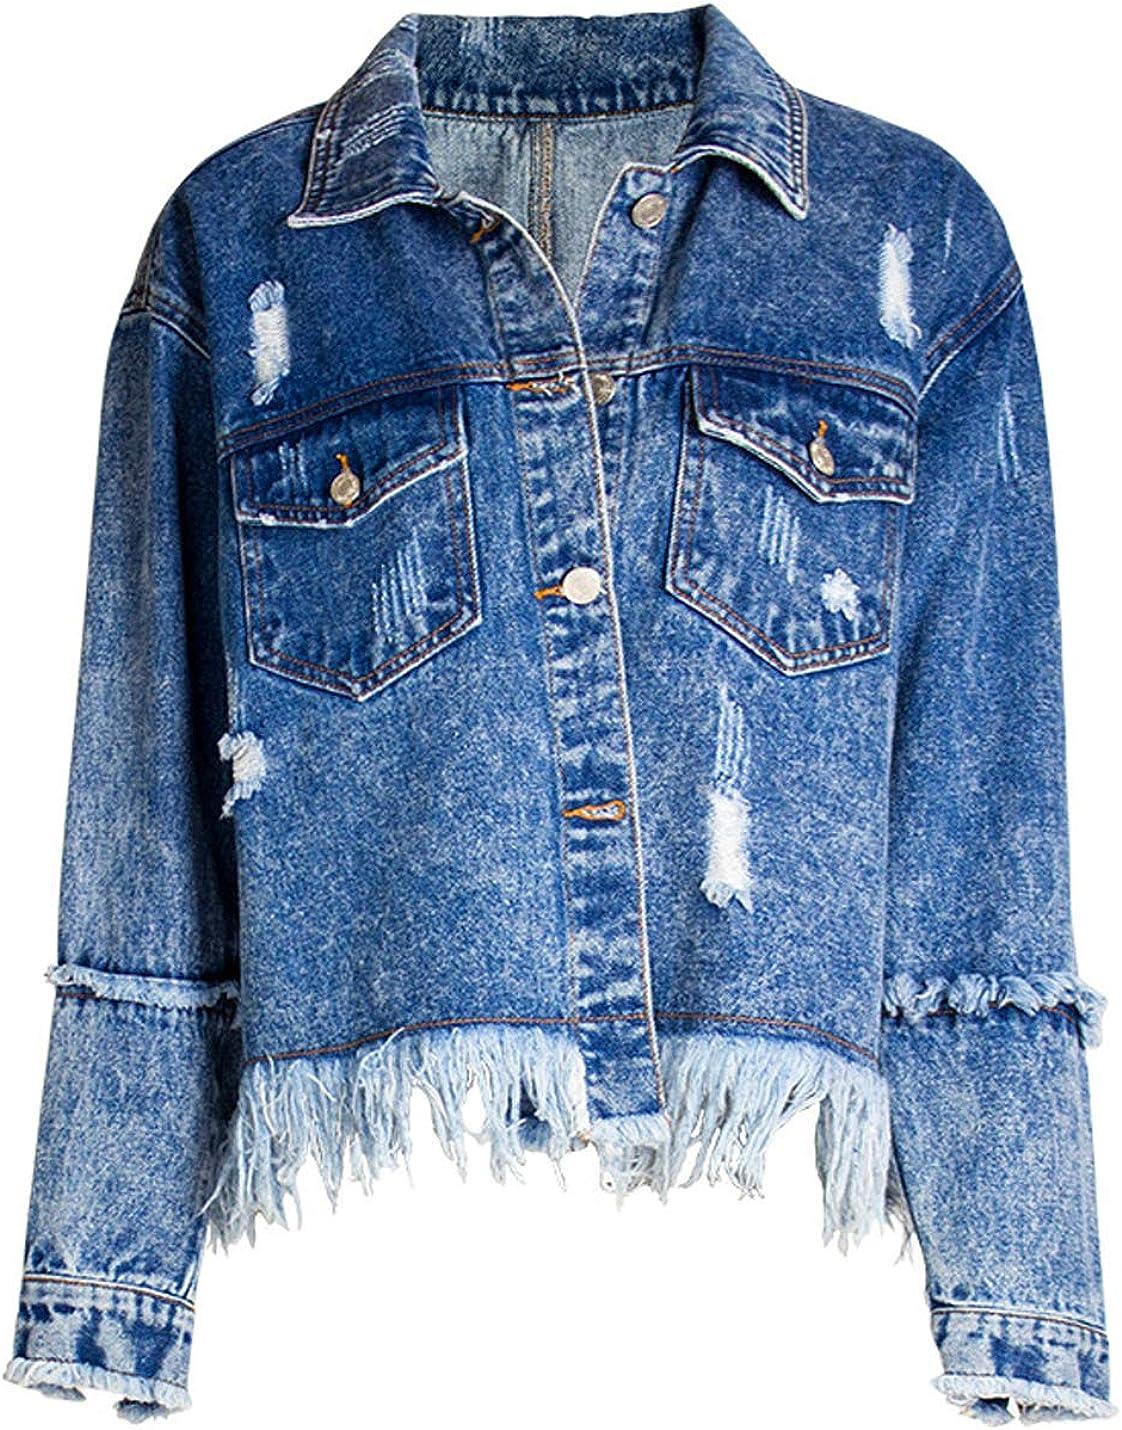 ZGZZ7 Women's Vintage Super sale Attention brand Broken Denim Jackets Buttons Casual Ripped